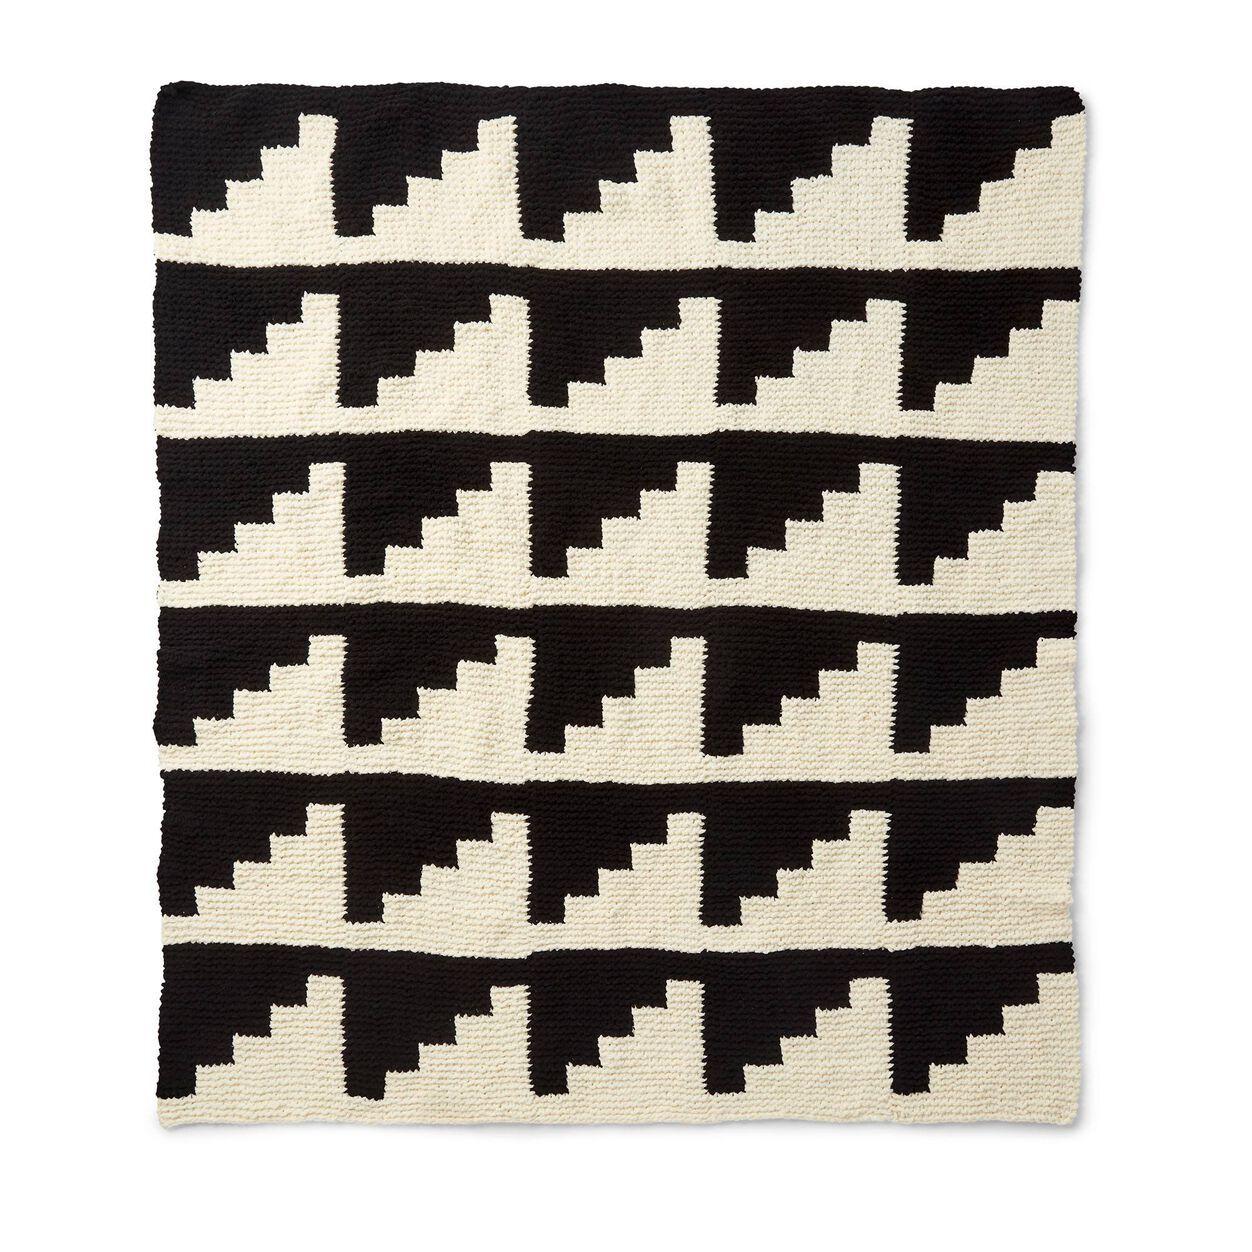 Bernat Geometric Knit Blanket